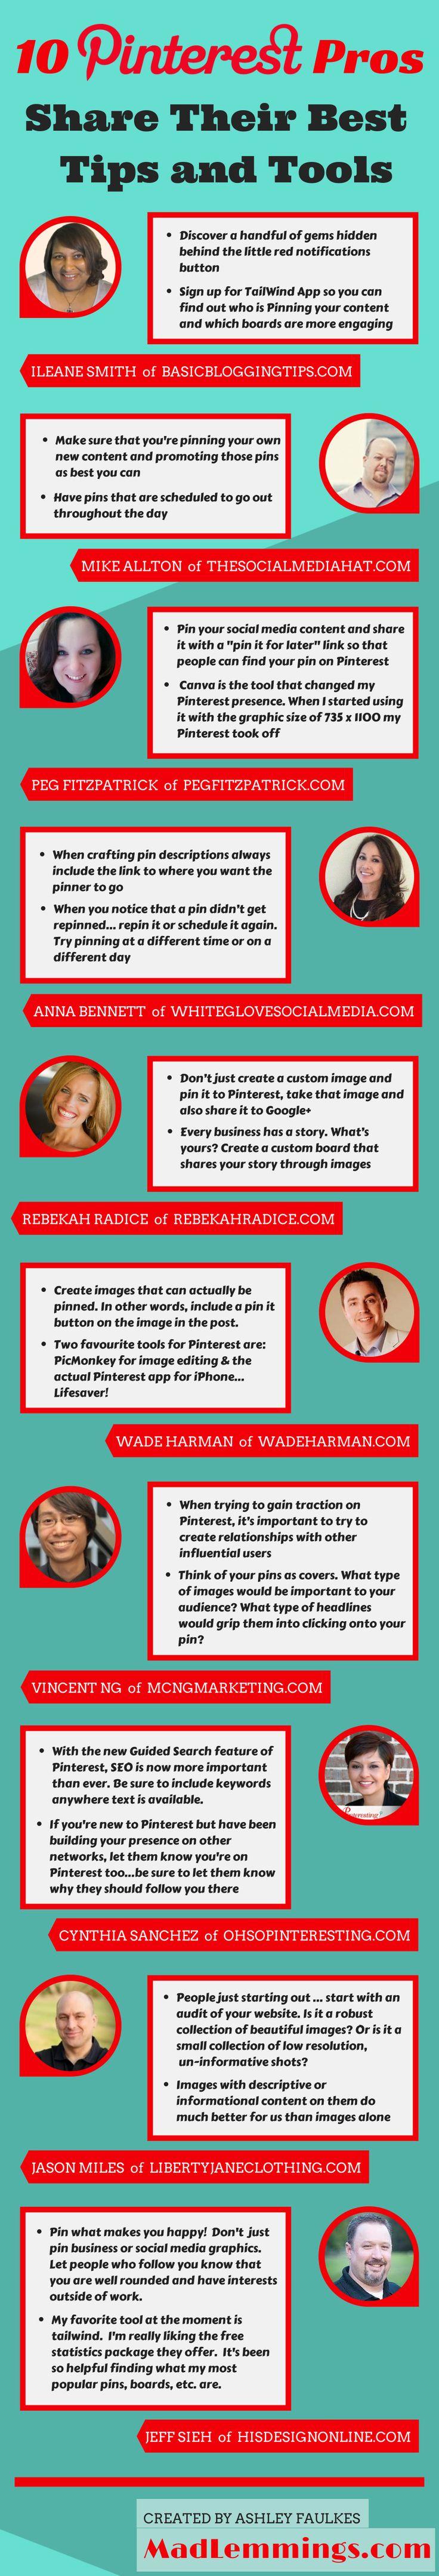 10 Pinterest Pros Tips Share Their Best Tips and Tools #pinterest #socialmedia http://madlemmings.com/2014/05/19/10-pinterest-pros-best-tools-tips/